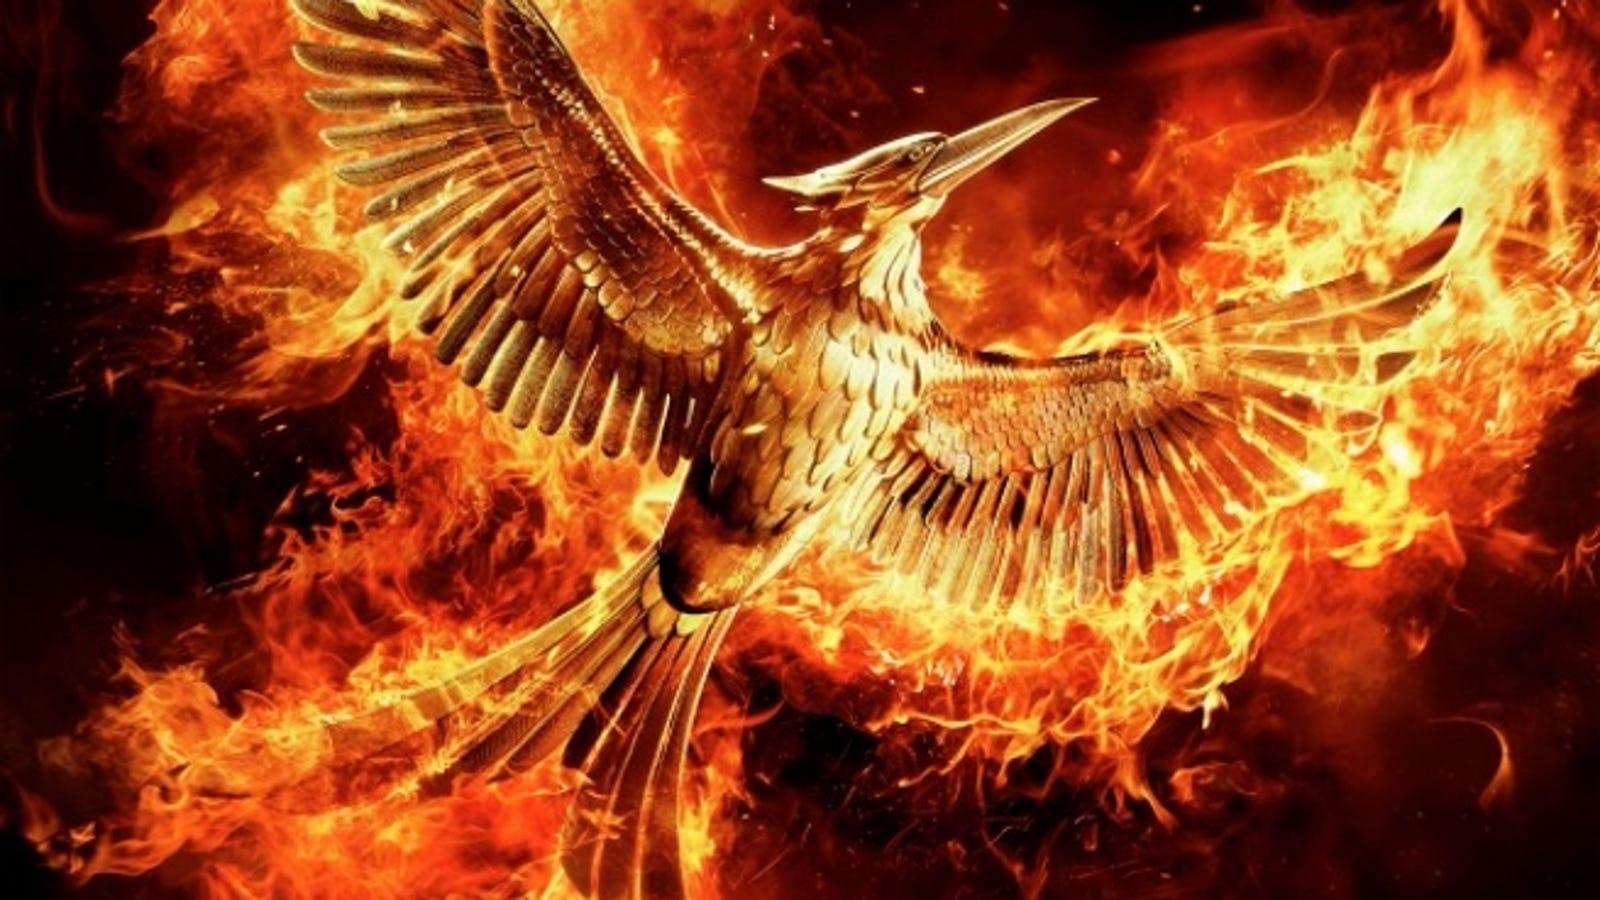 Primer teaser de The Hunger Games Mockingjay Part 2: el sinsajo regresa